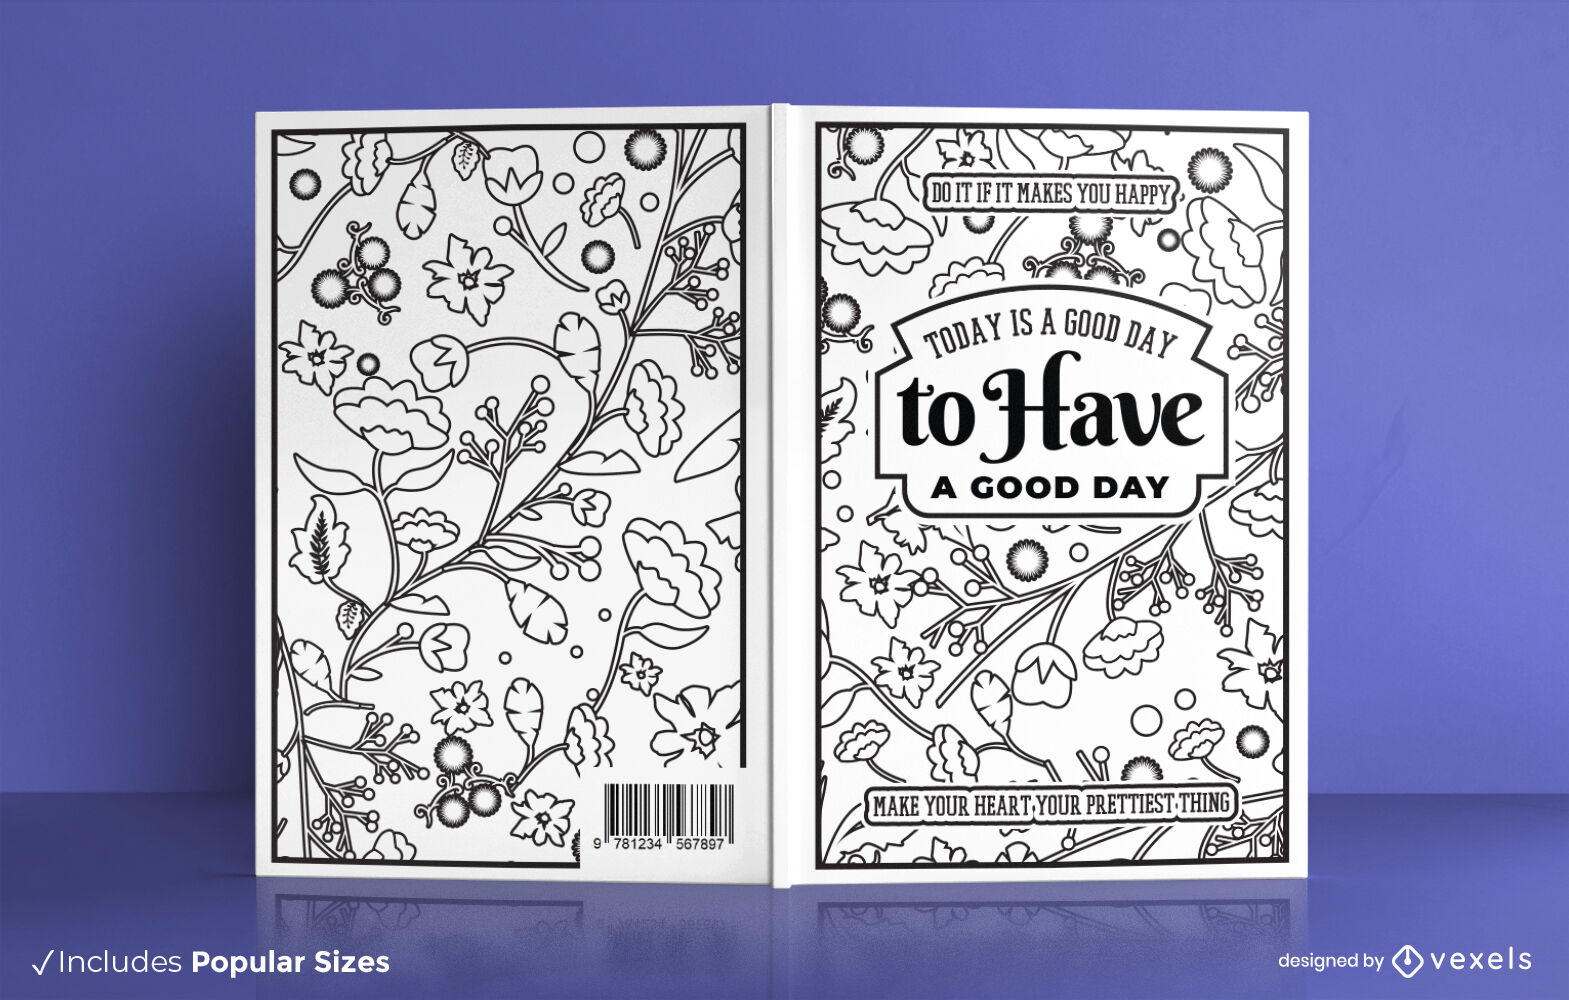 Floral motivational coloring book cover design